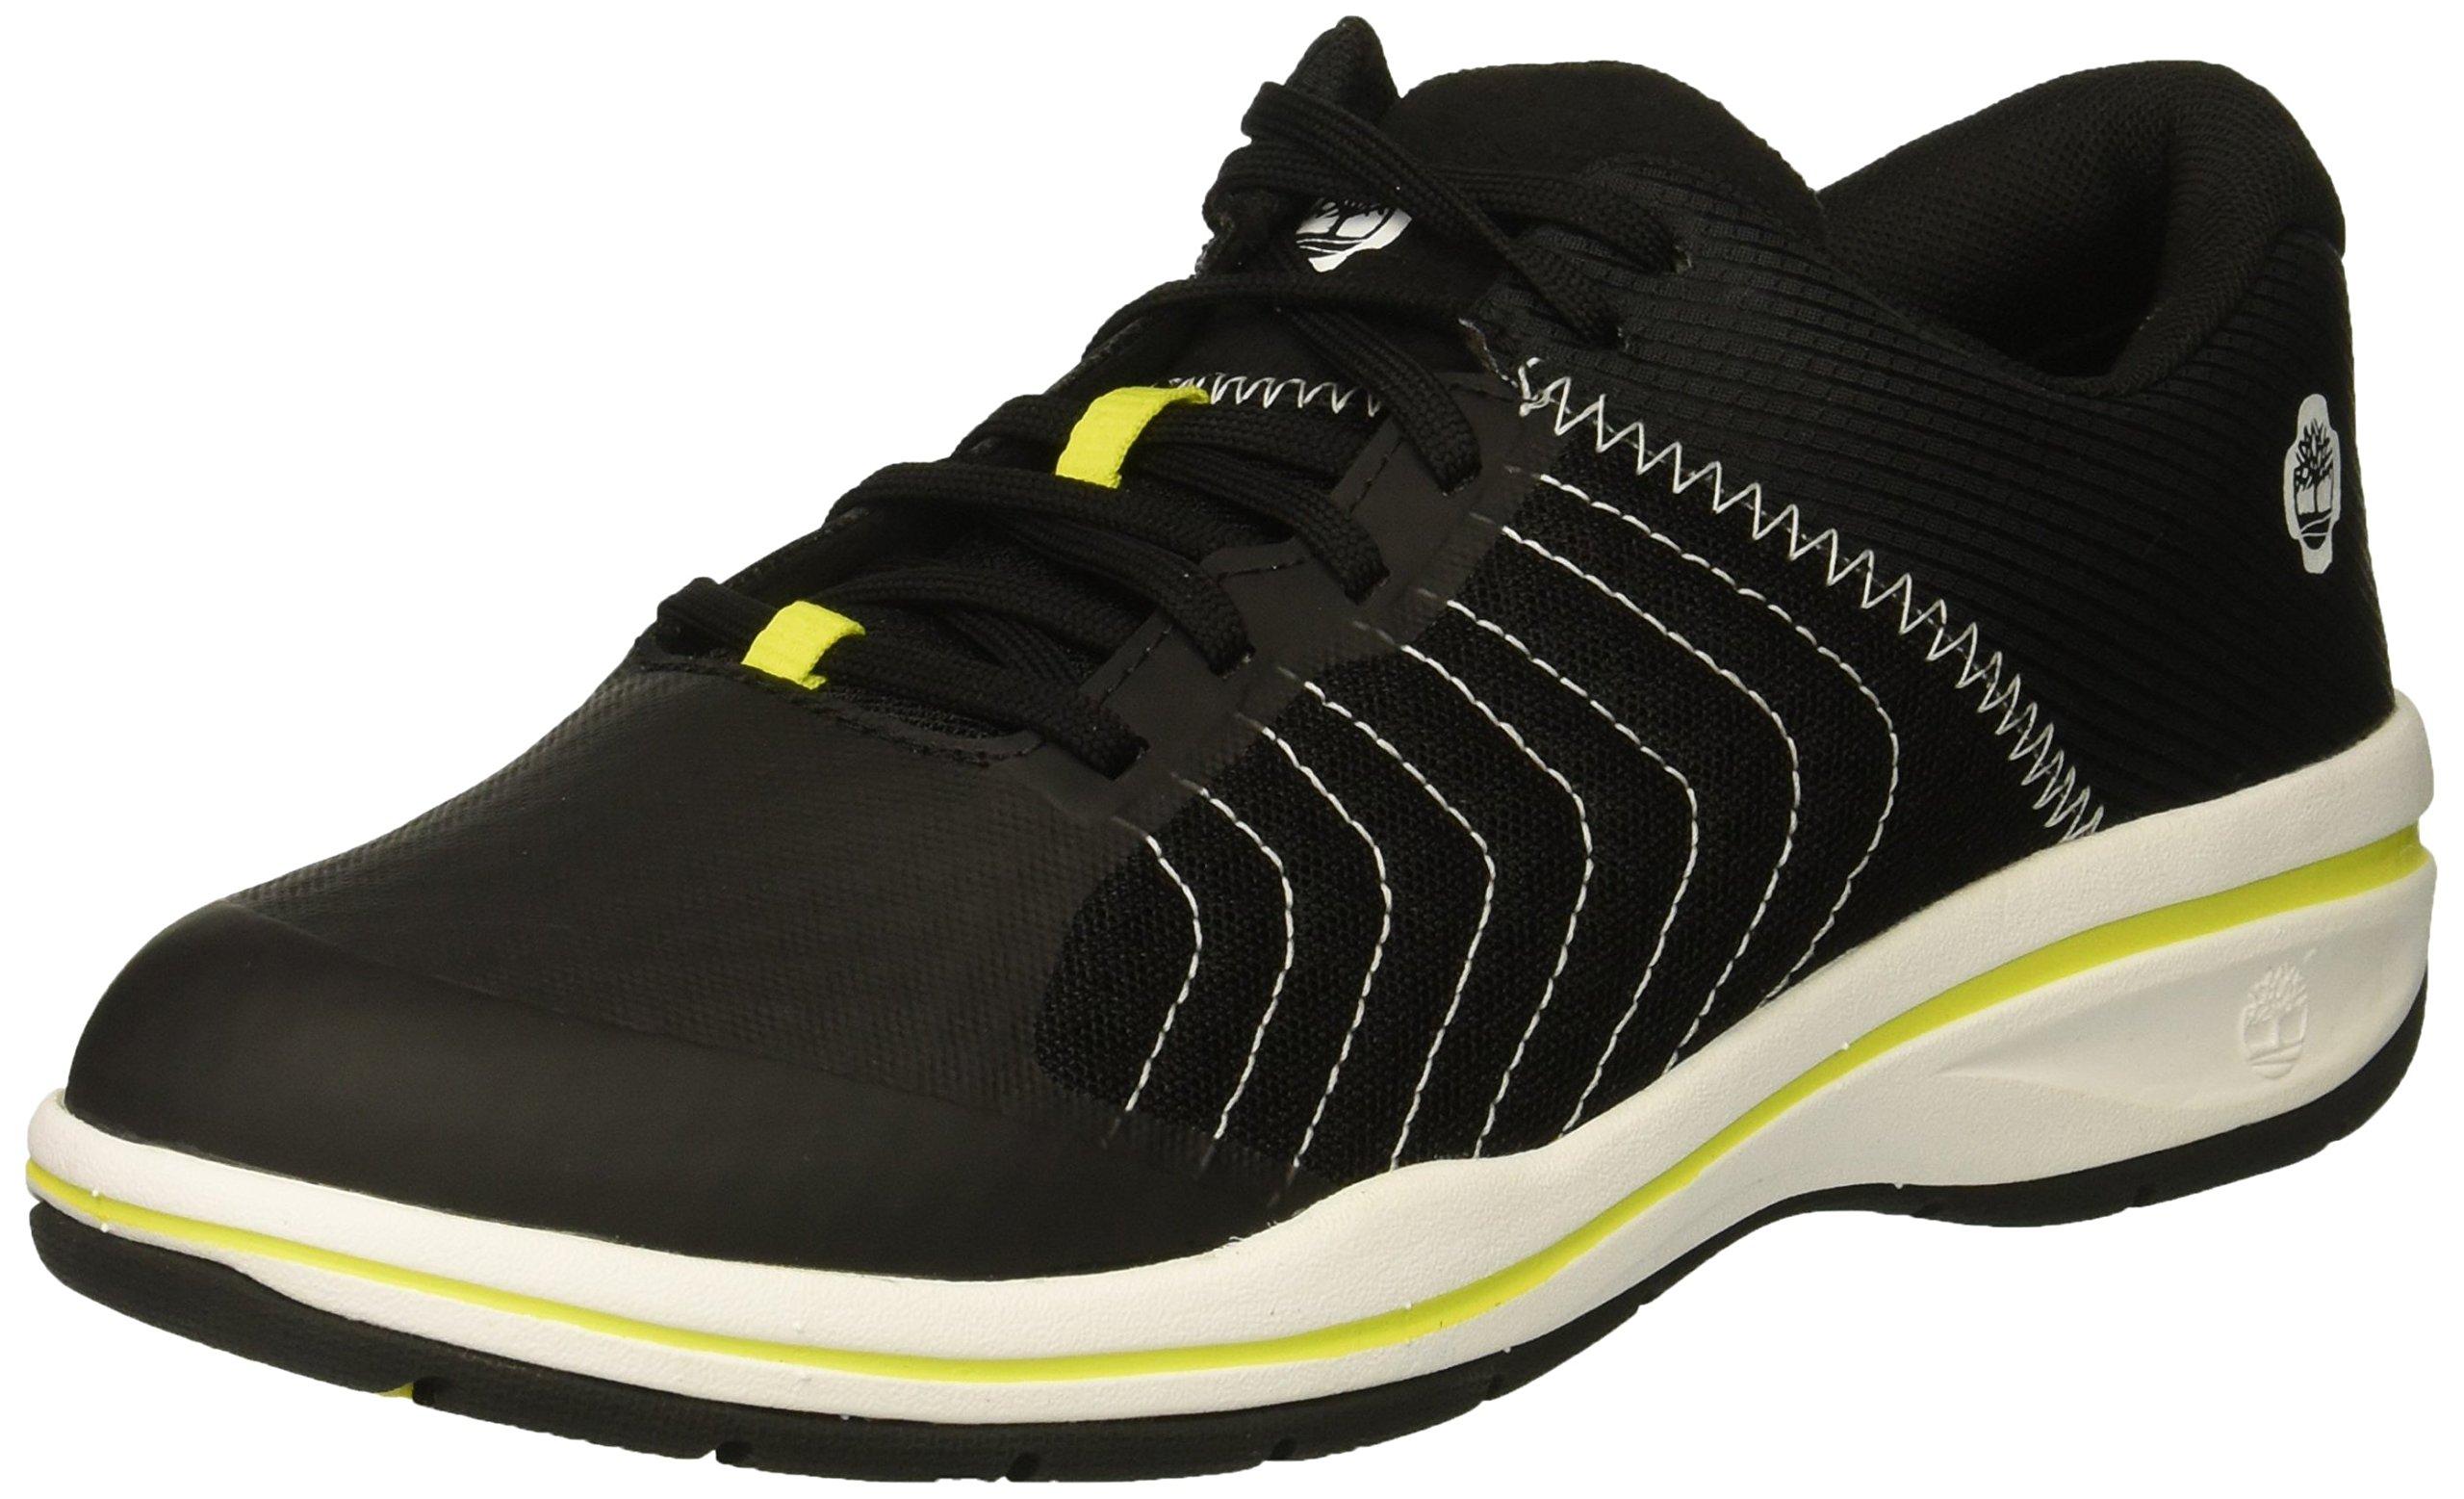 Timberland PRO Women's Healthcare Sport Soft Toe Health Care Professional Shoe, Black, 7.5 M US